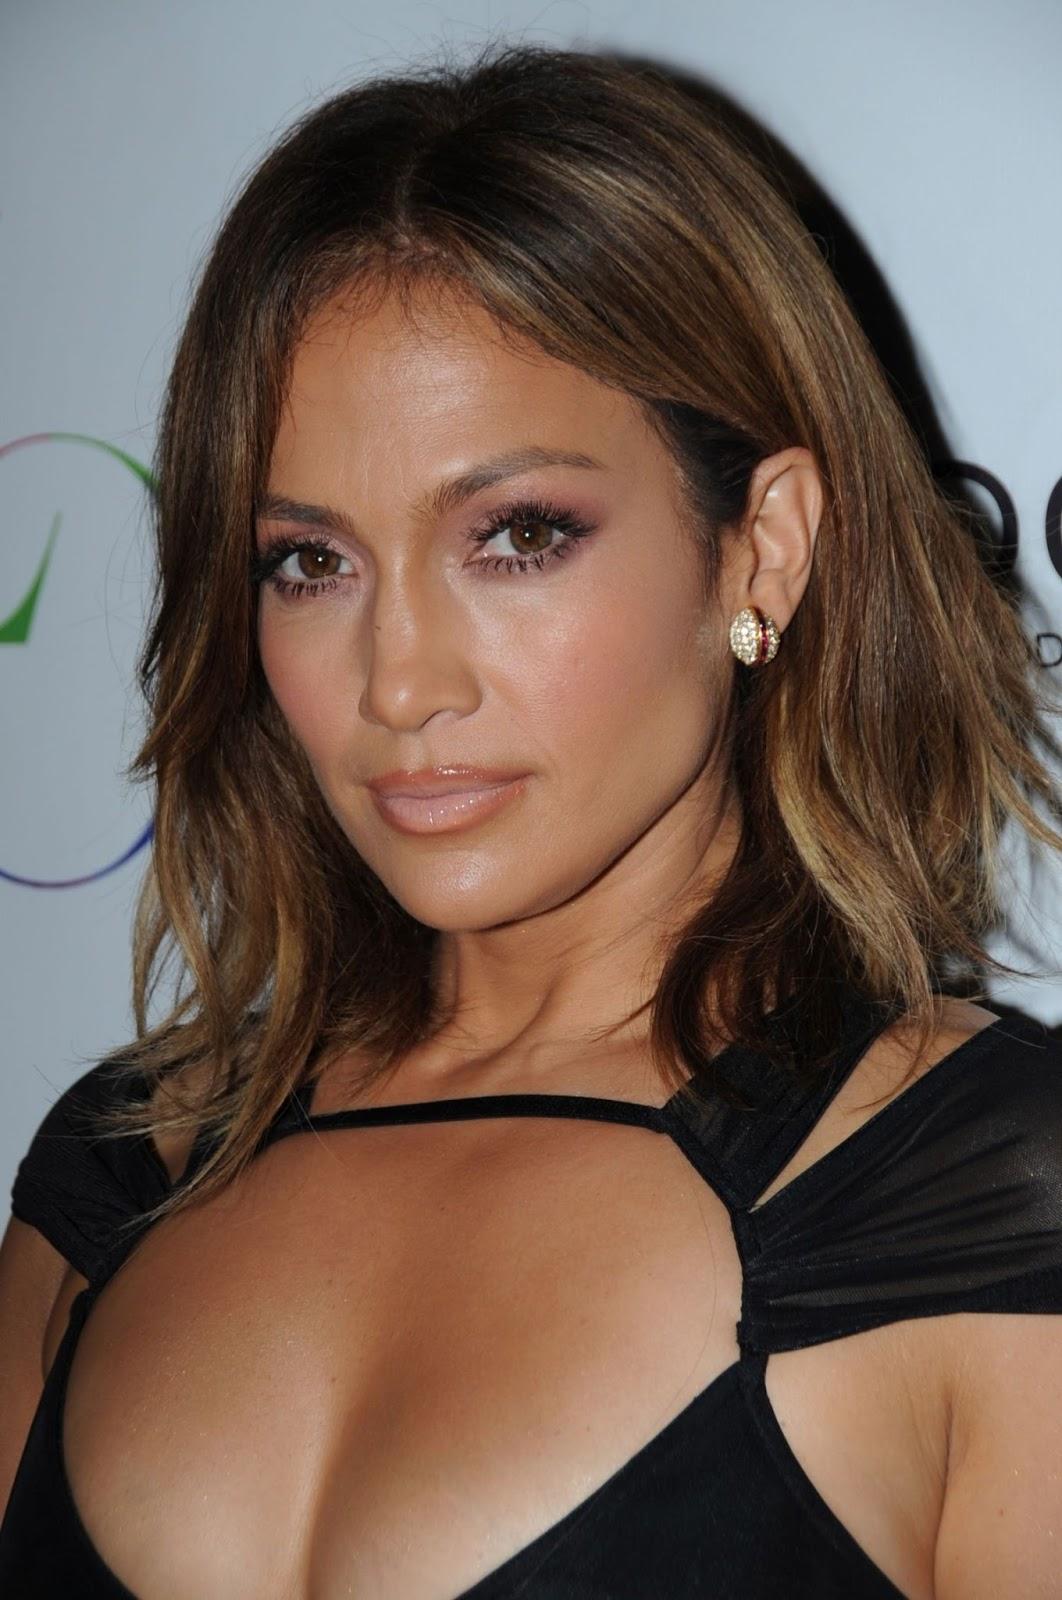 Jennifer Lopez are părul vopsit prin tehnica Bronde, Foto: acelebstoday.blogspot.com